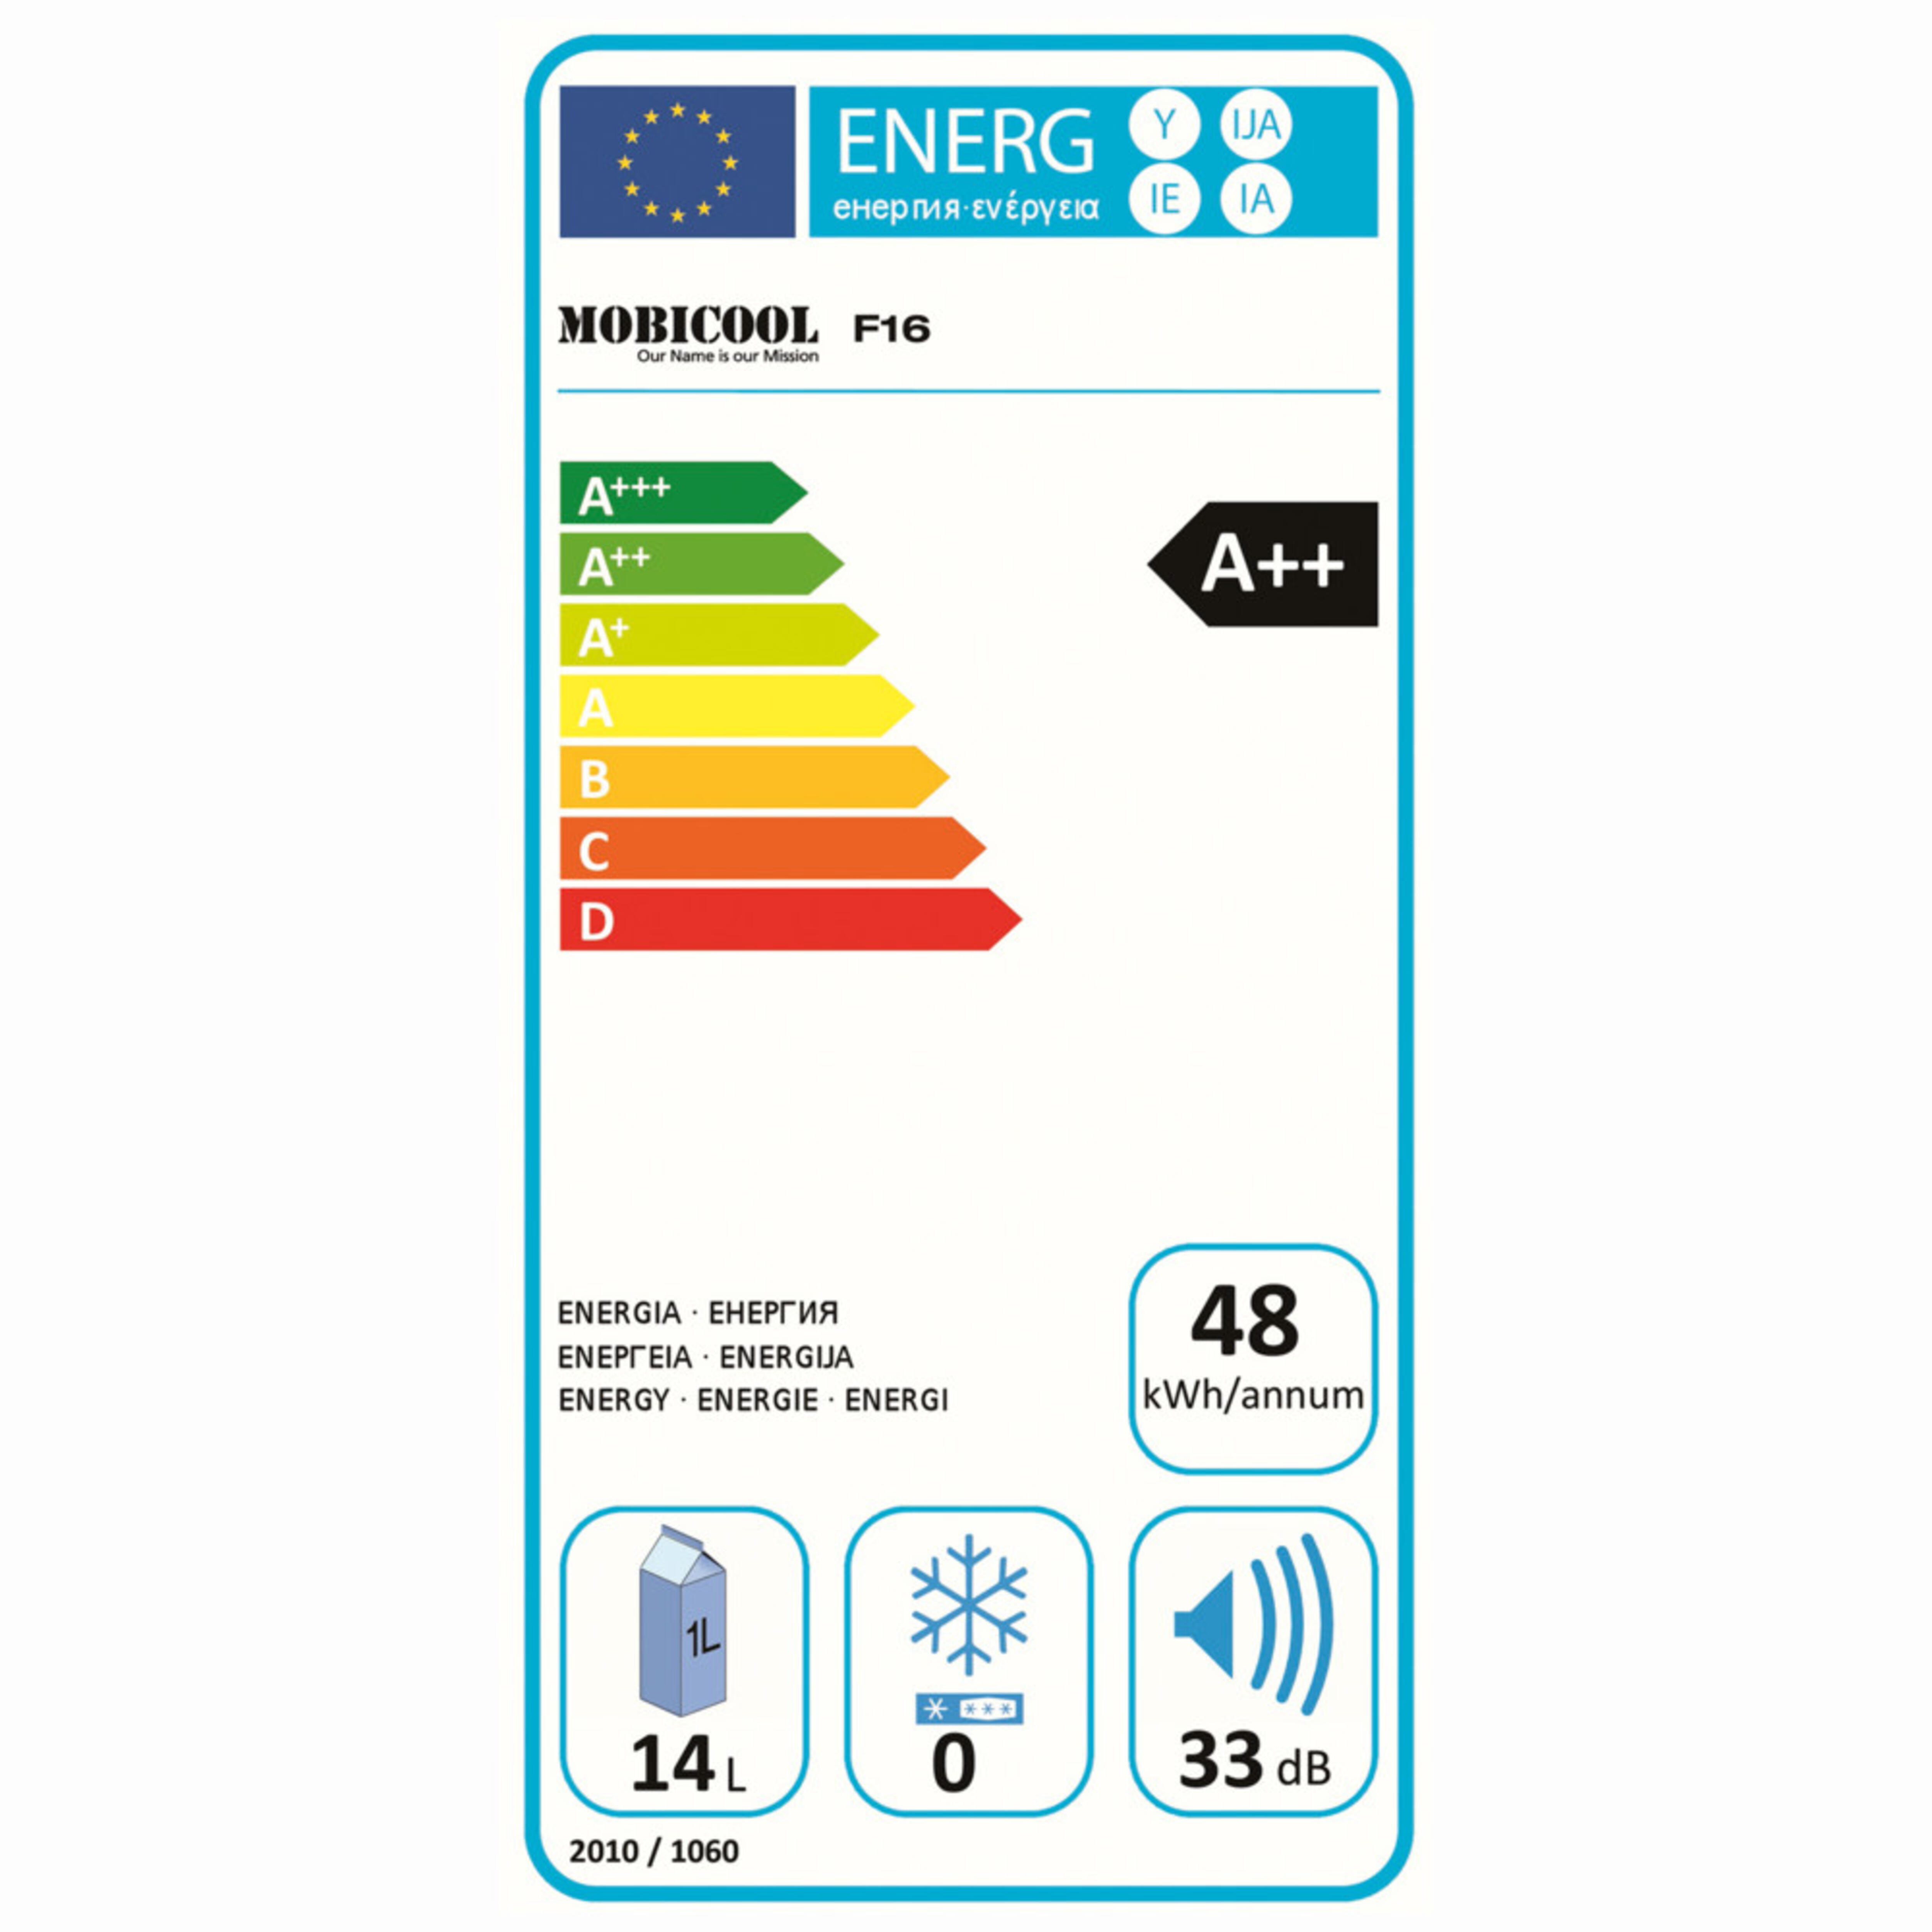 Mobicool F16 Energy label